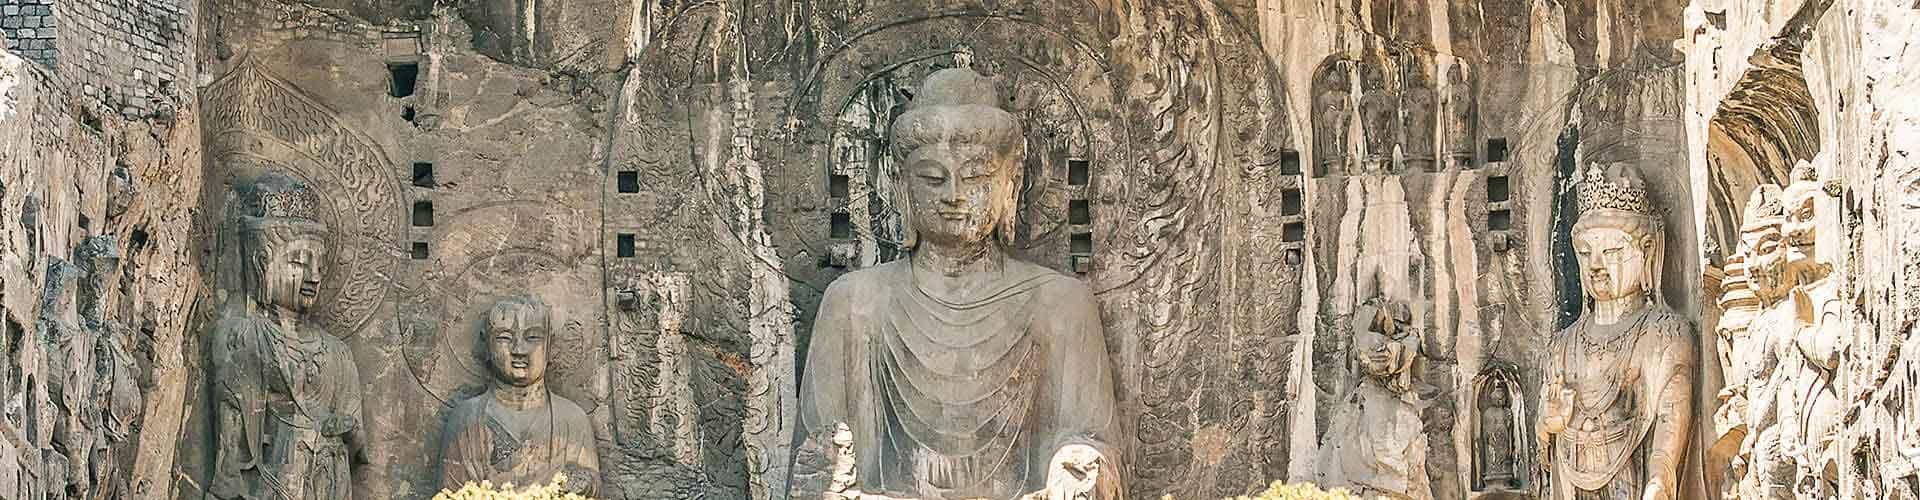 China World Heritage Discovery